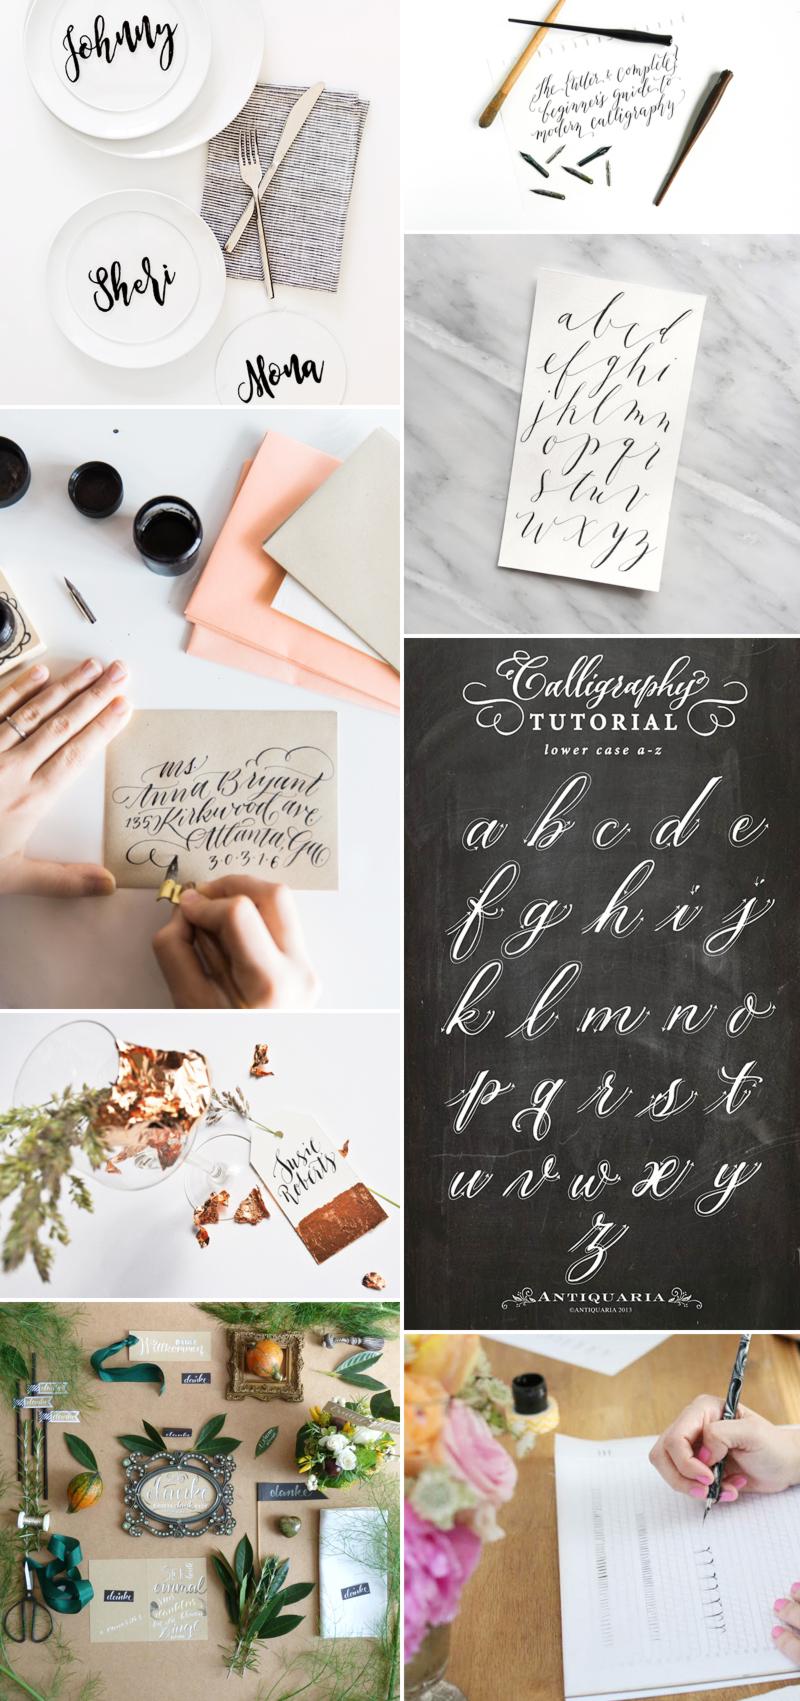 we love Inspiration: Kalligraphie | we love handmade